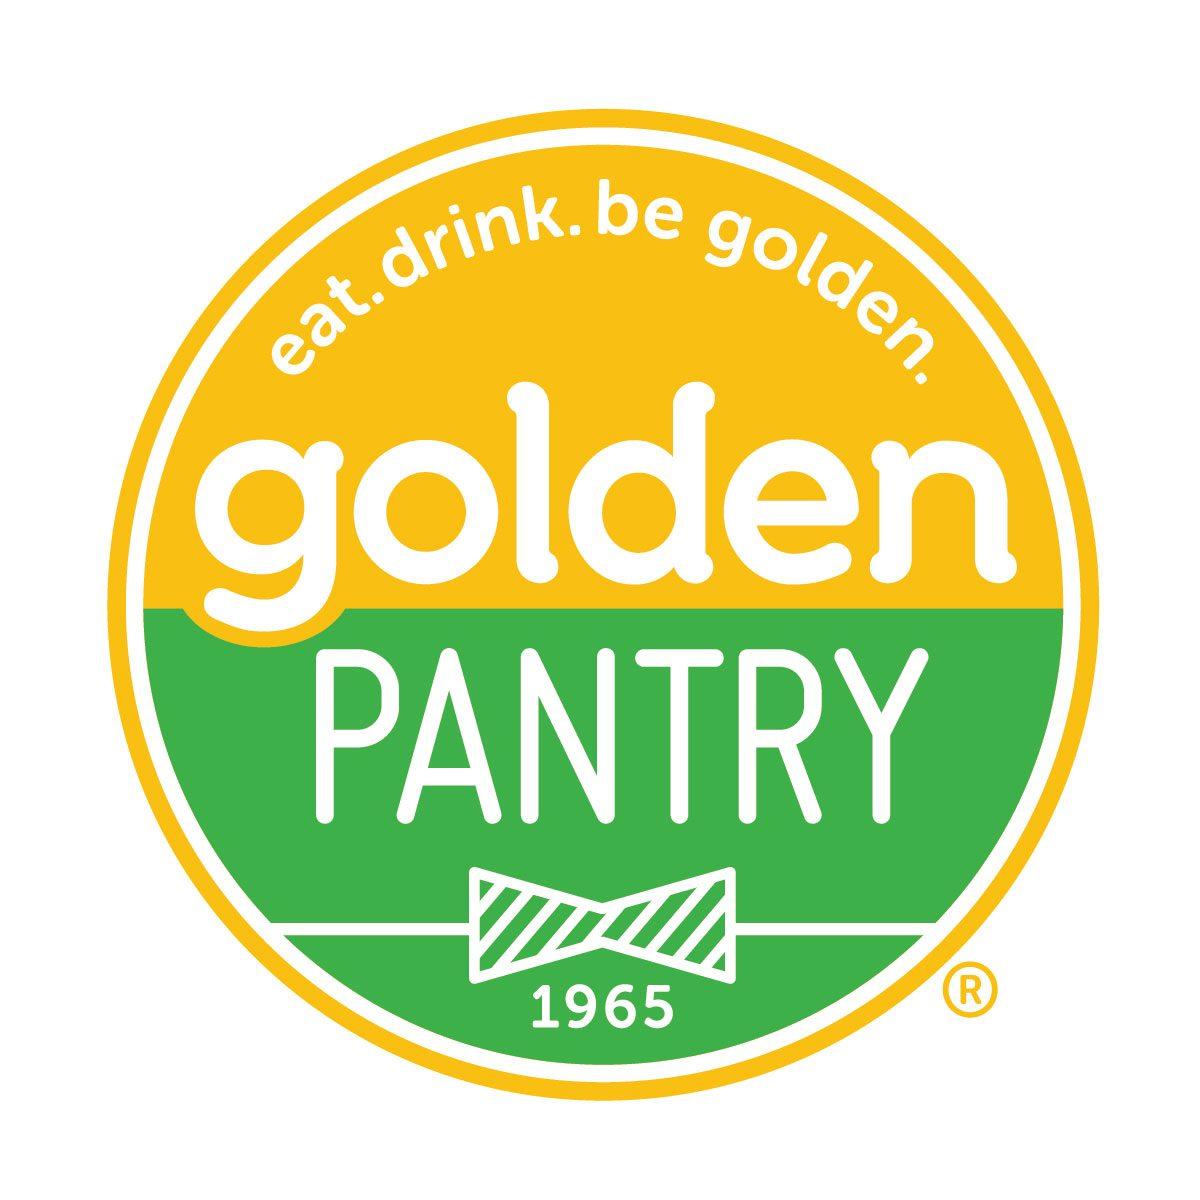 Golden Pantry